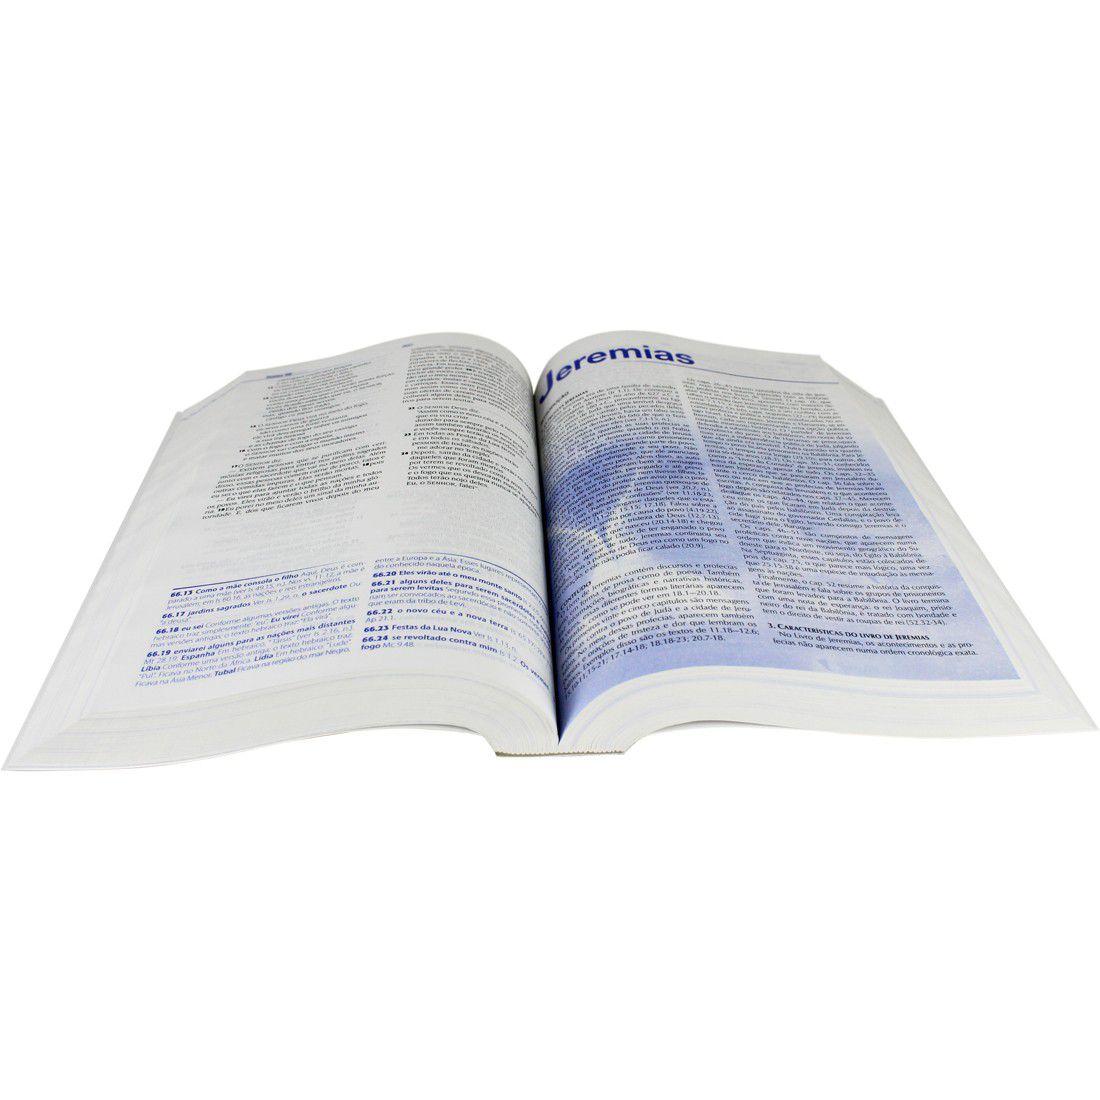 Bíblia de Estudo NTLH SBB Brochura c/ Capa  - Livraria Betel